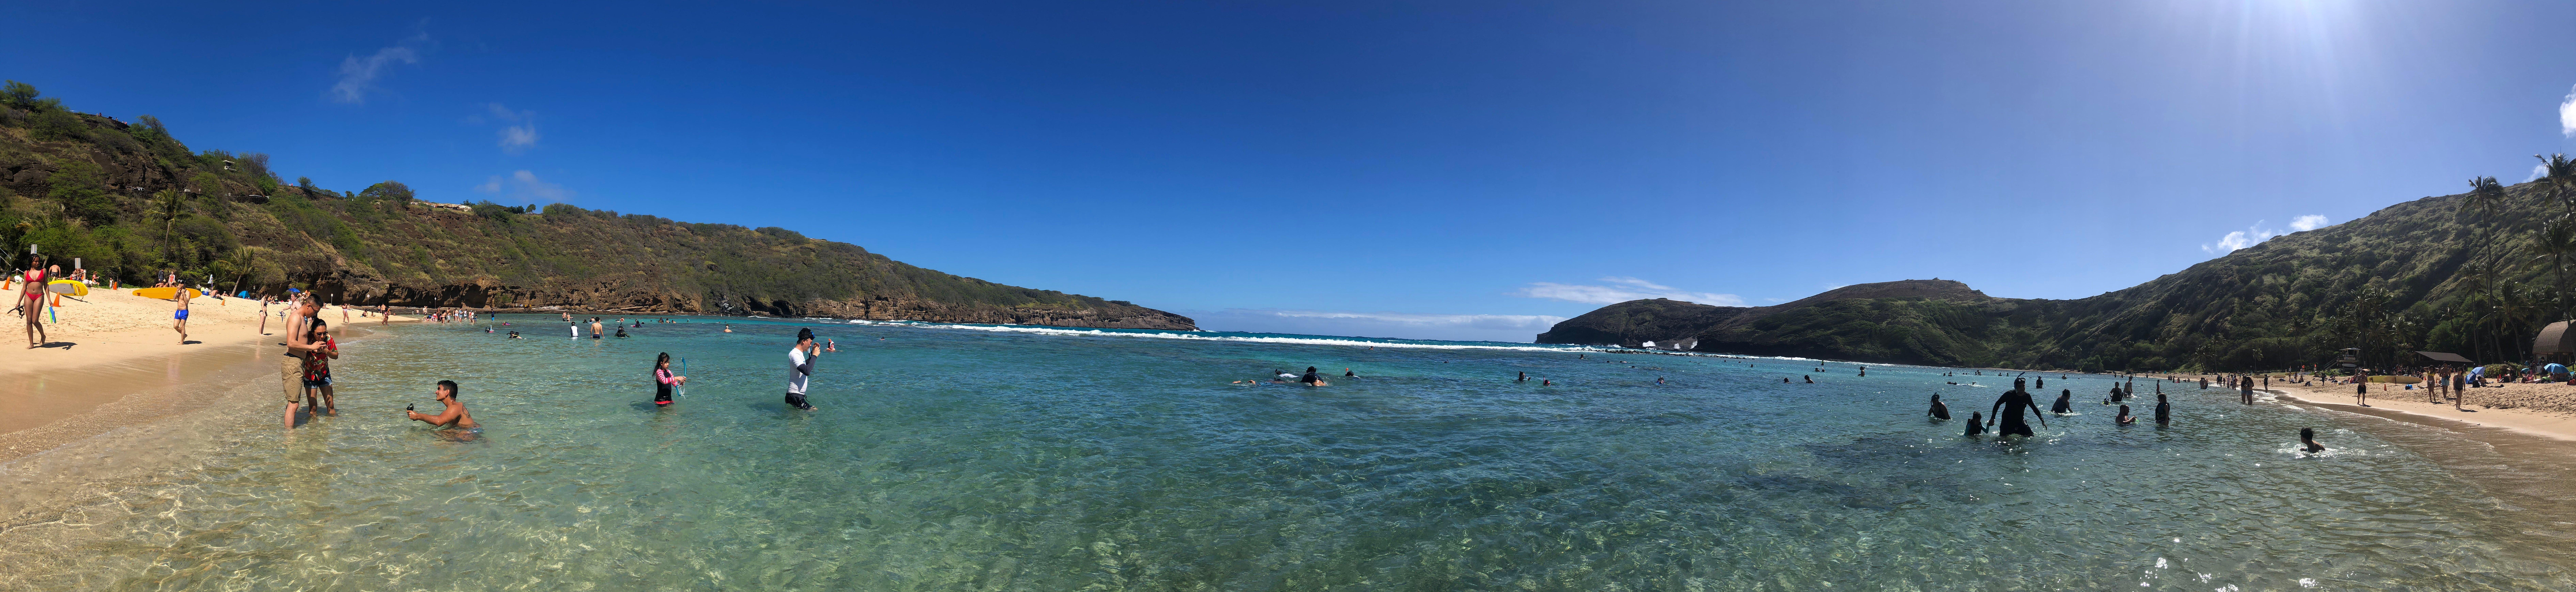 USA Hawaii snorkeling 1